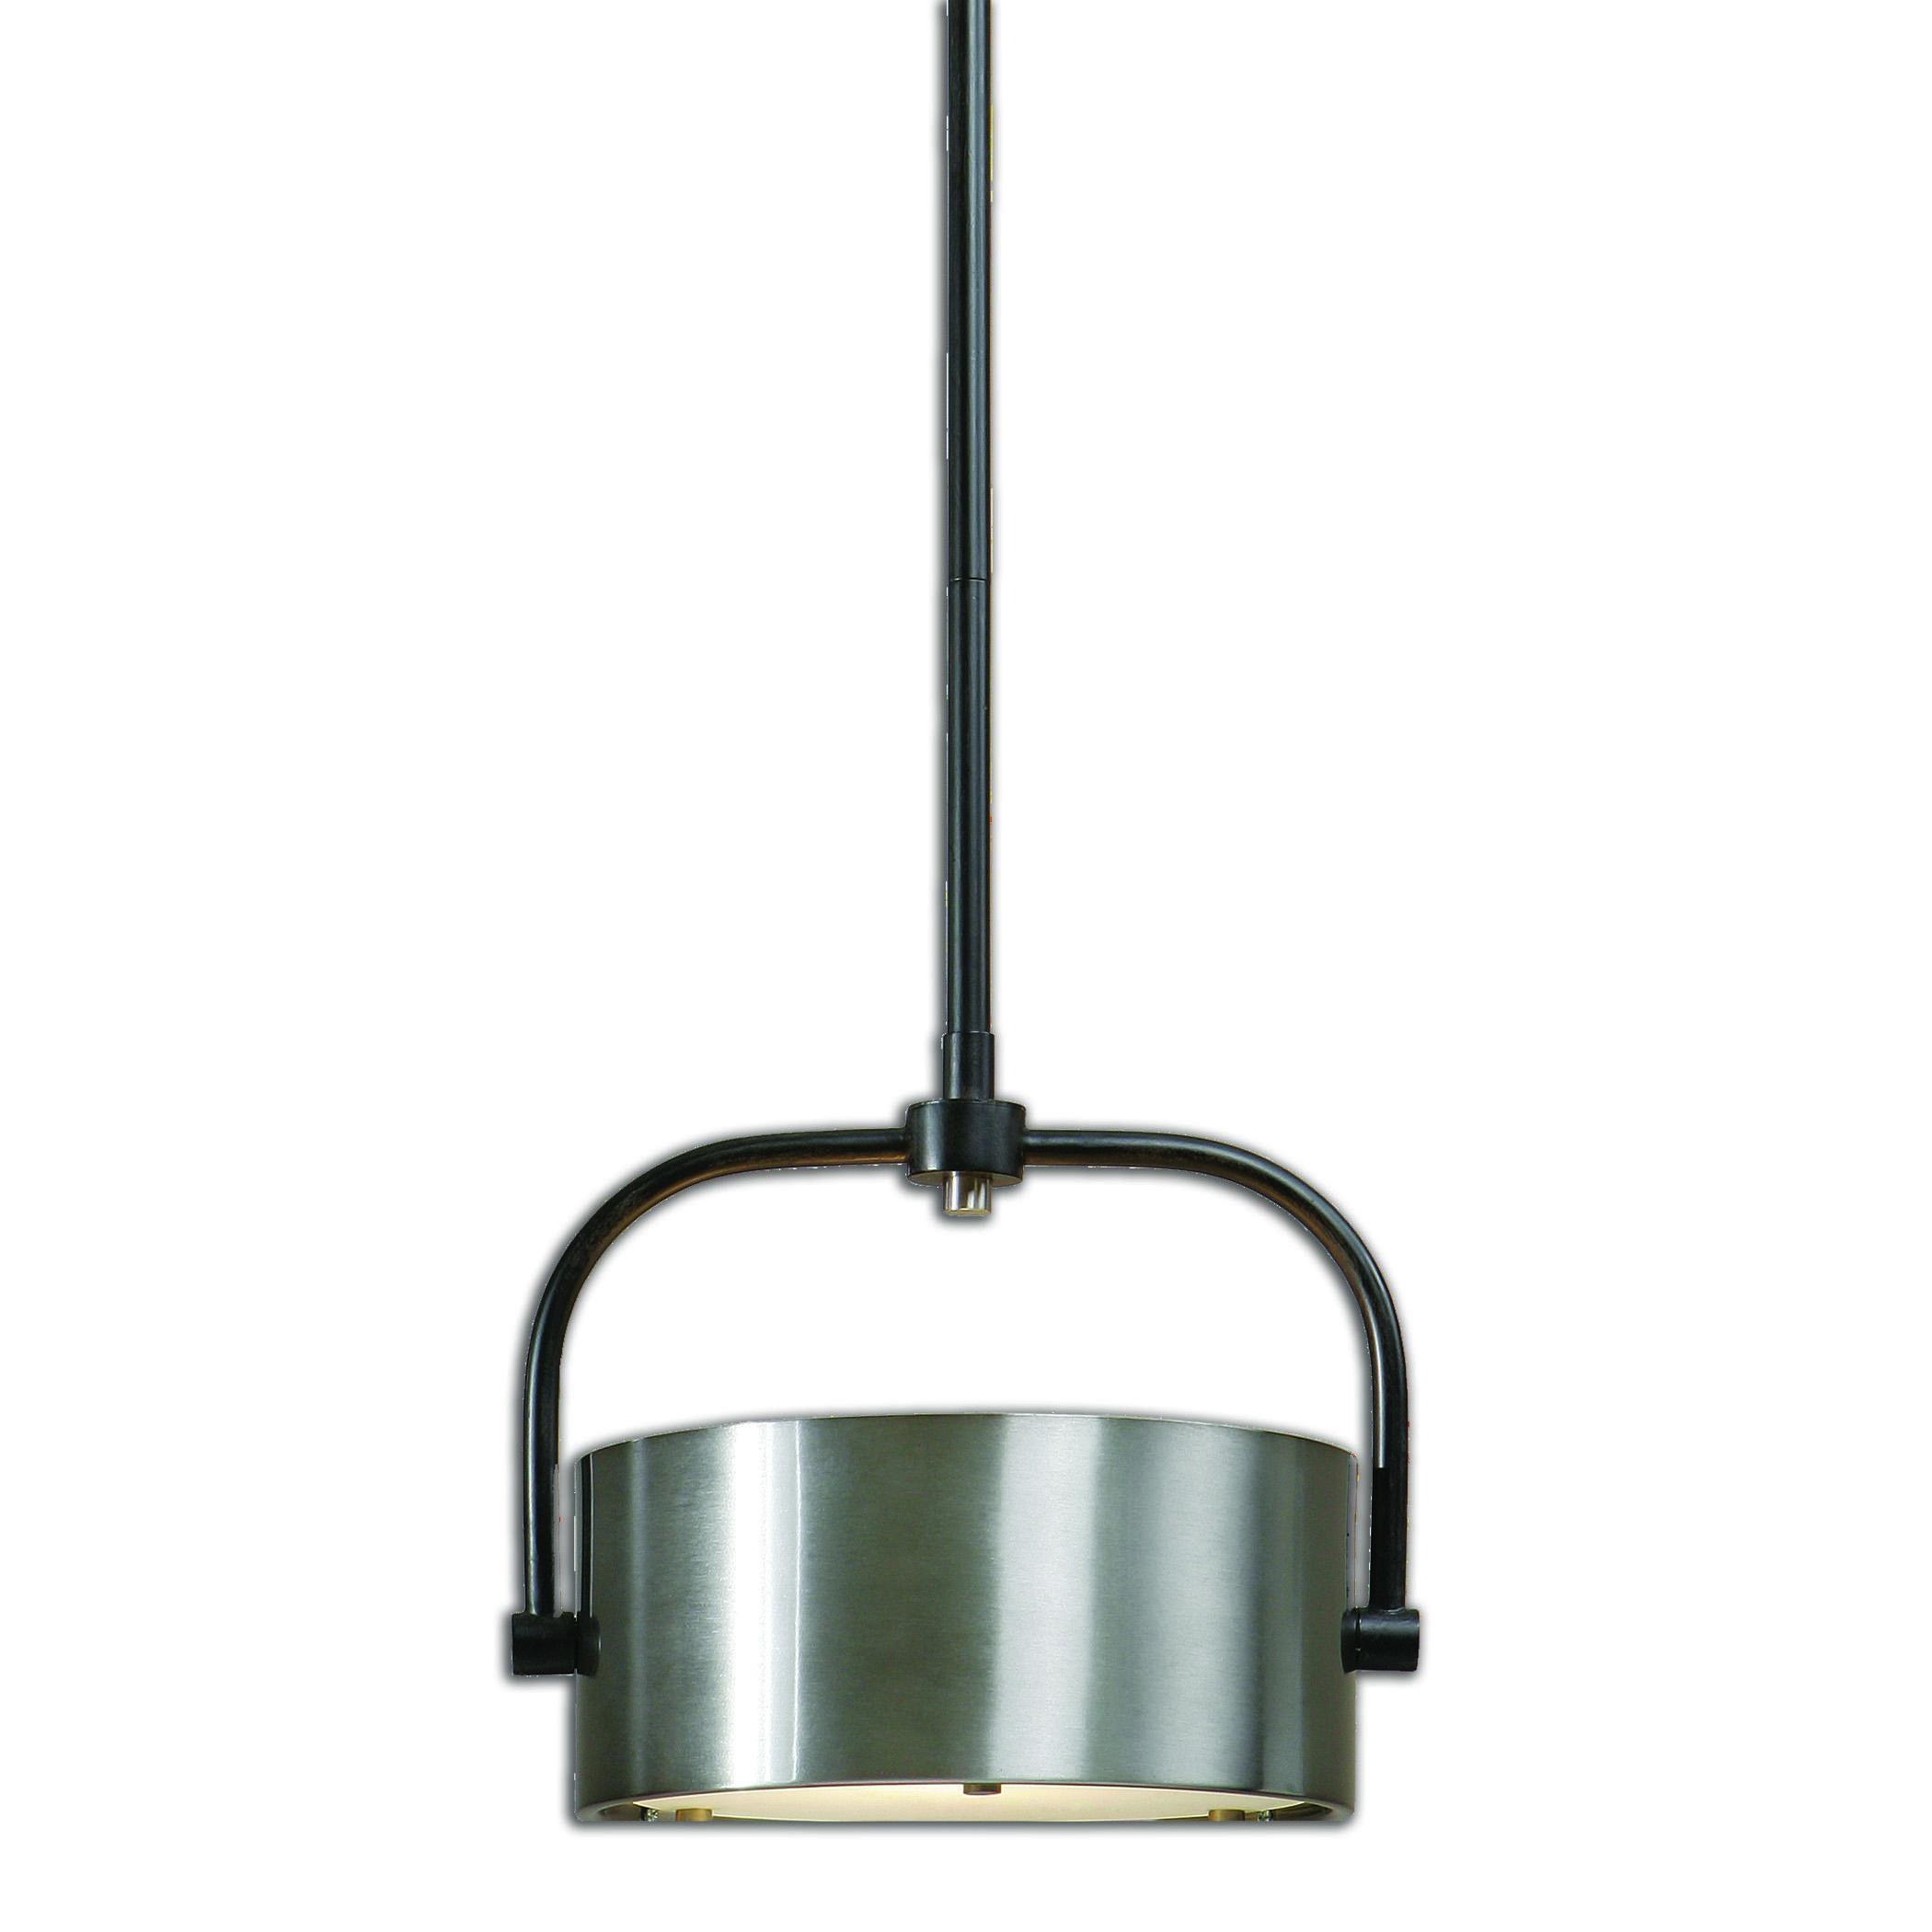 Uttermost Lighting Fixtures Uttermost Belding 1 Light Industrial Mini Pe - Item Number: 22029